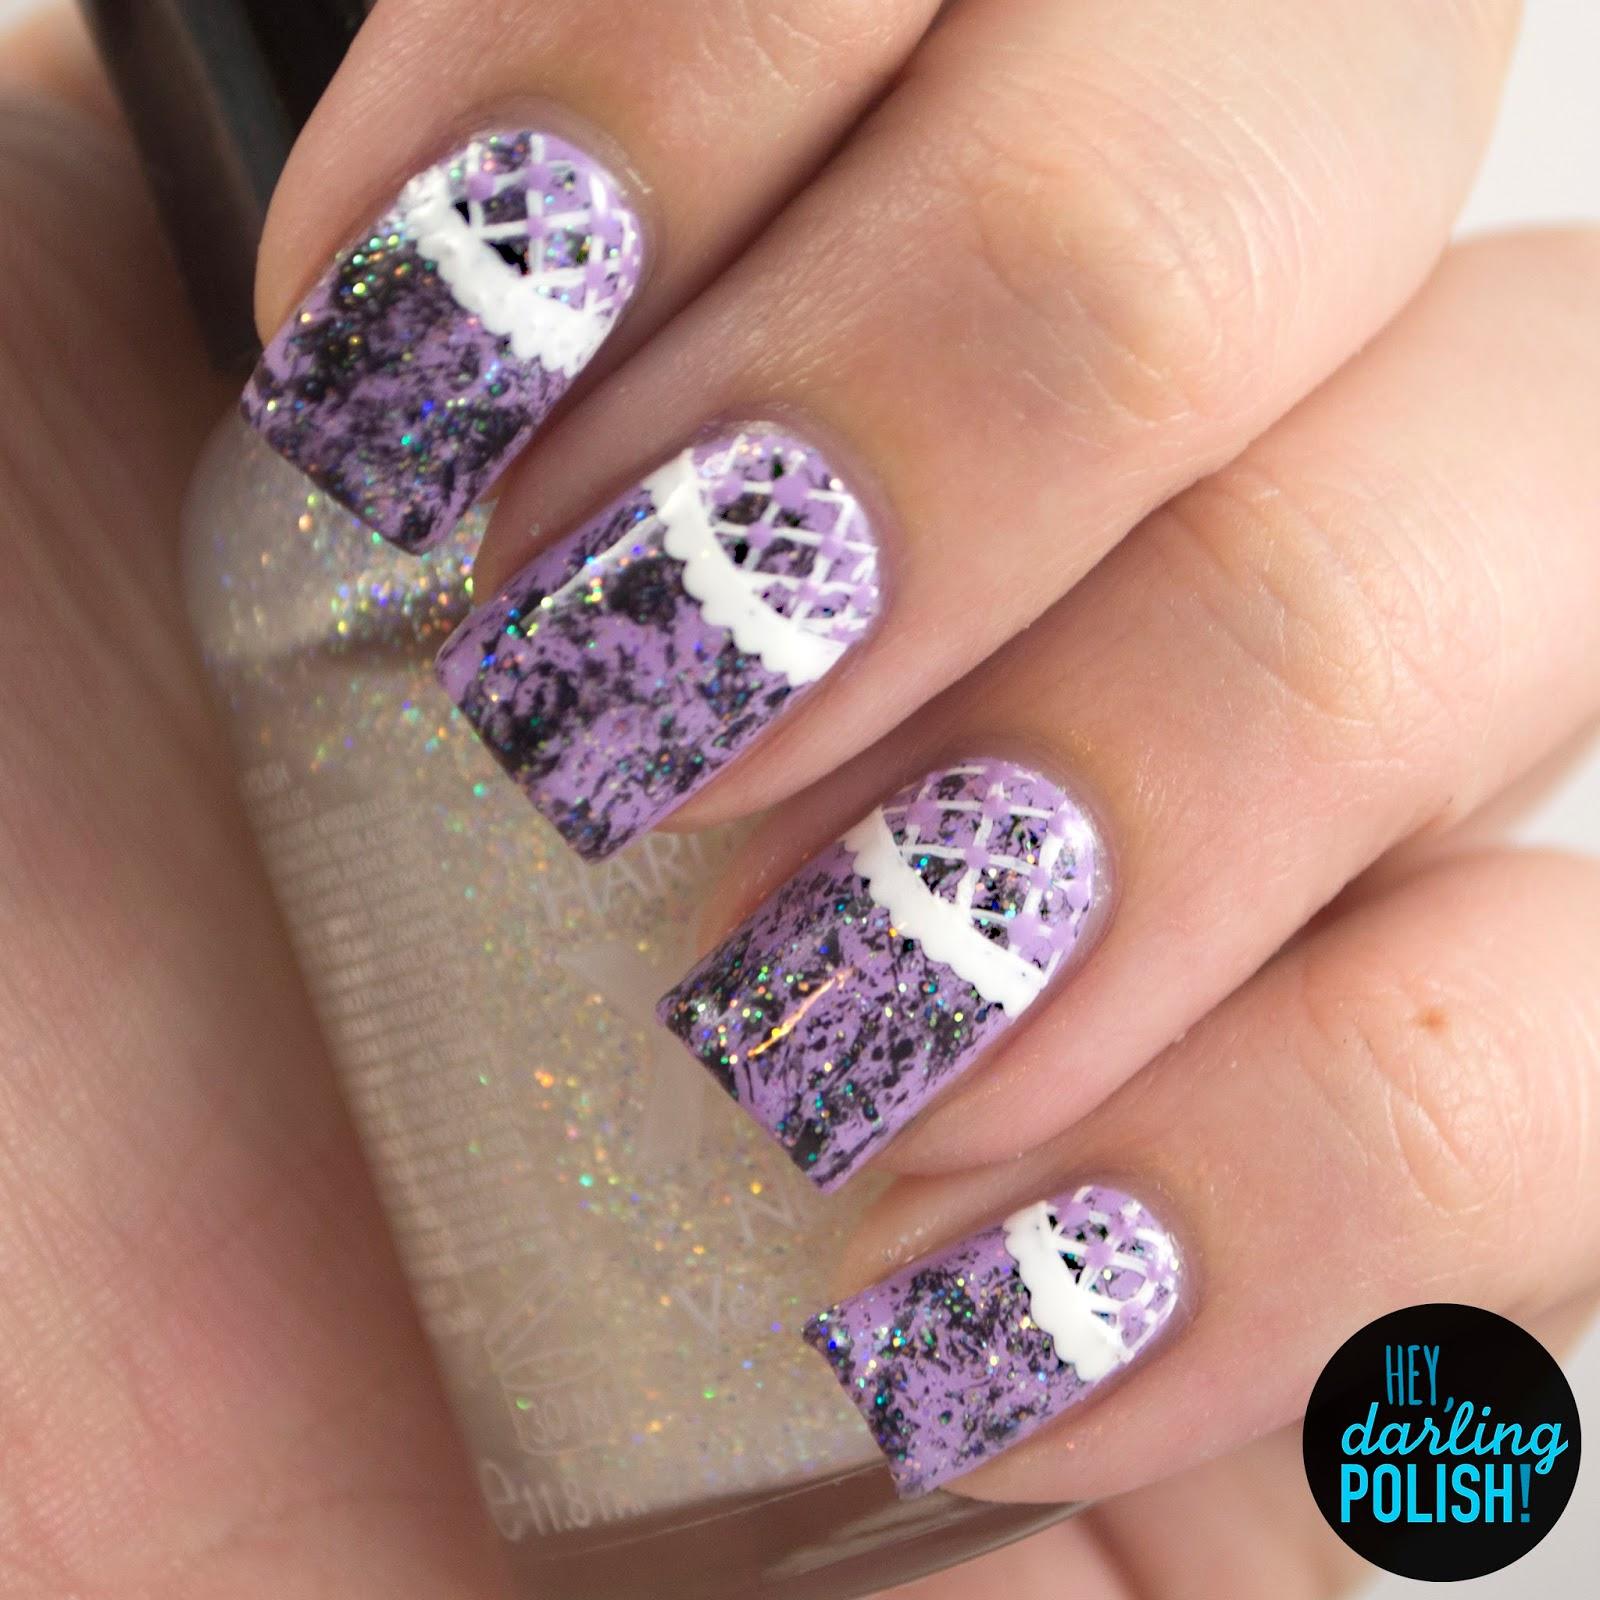 nails, nail art, nail polish, polish, lilac, white, lace, black, sparkle, golden oldie thursdays, hey darling polish